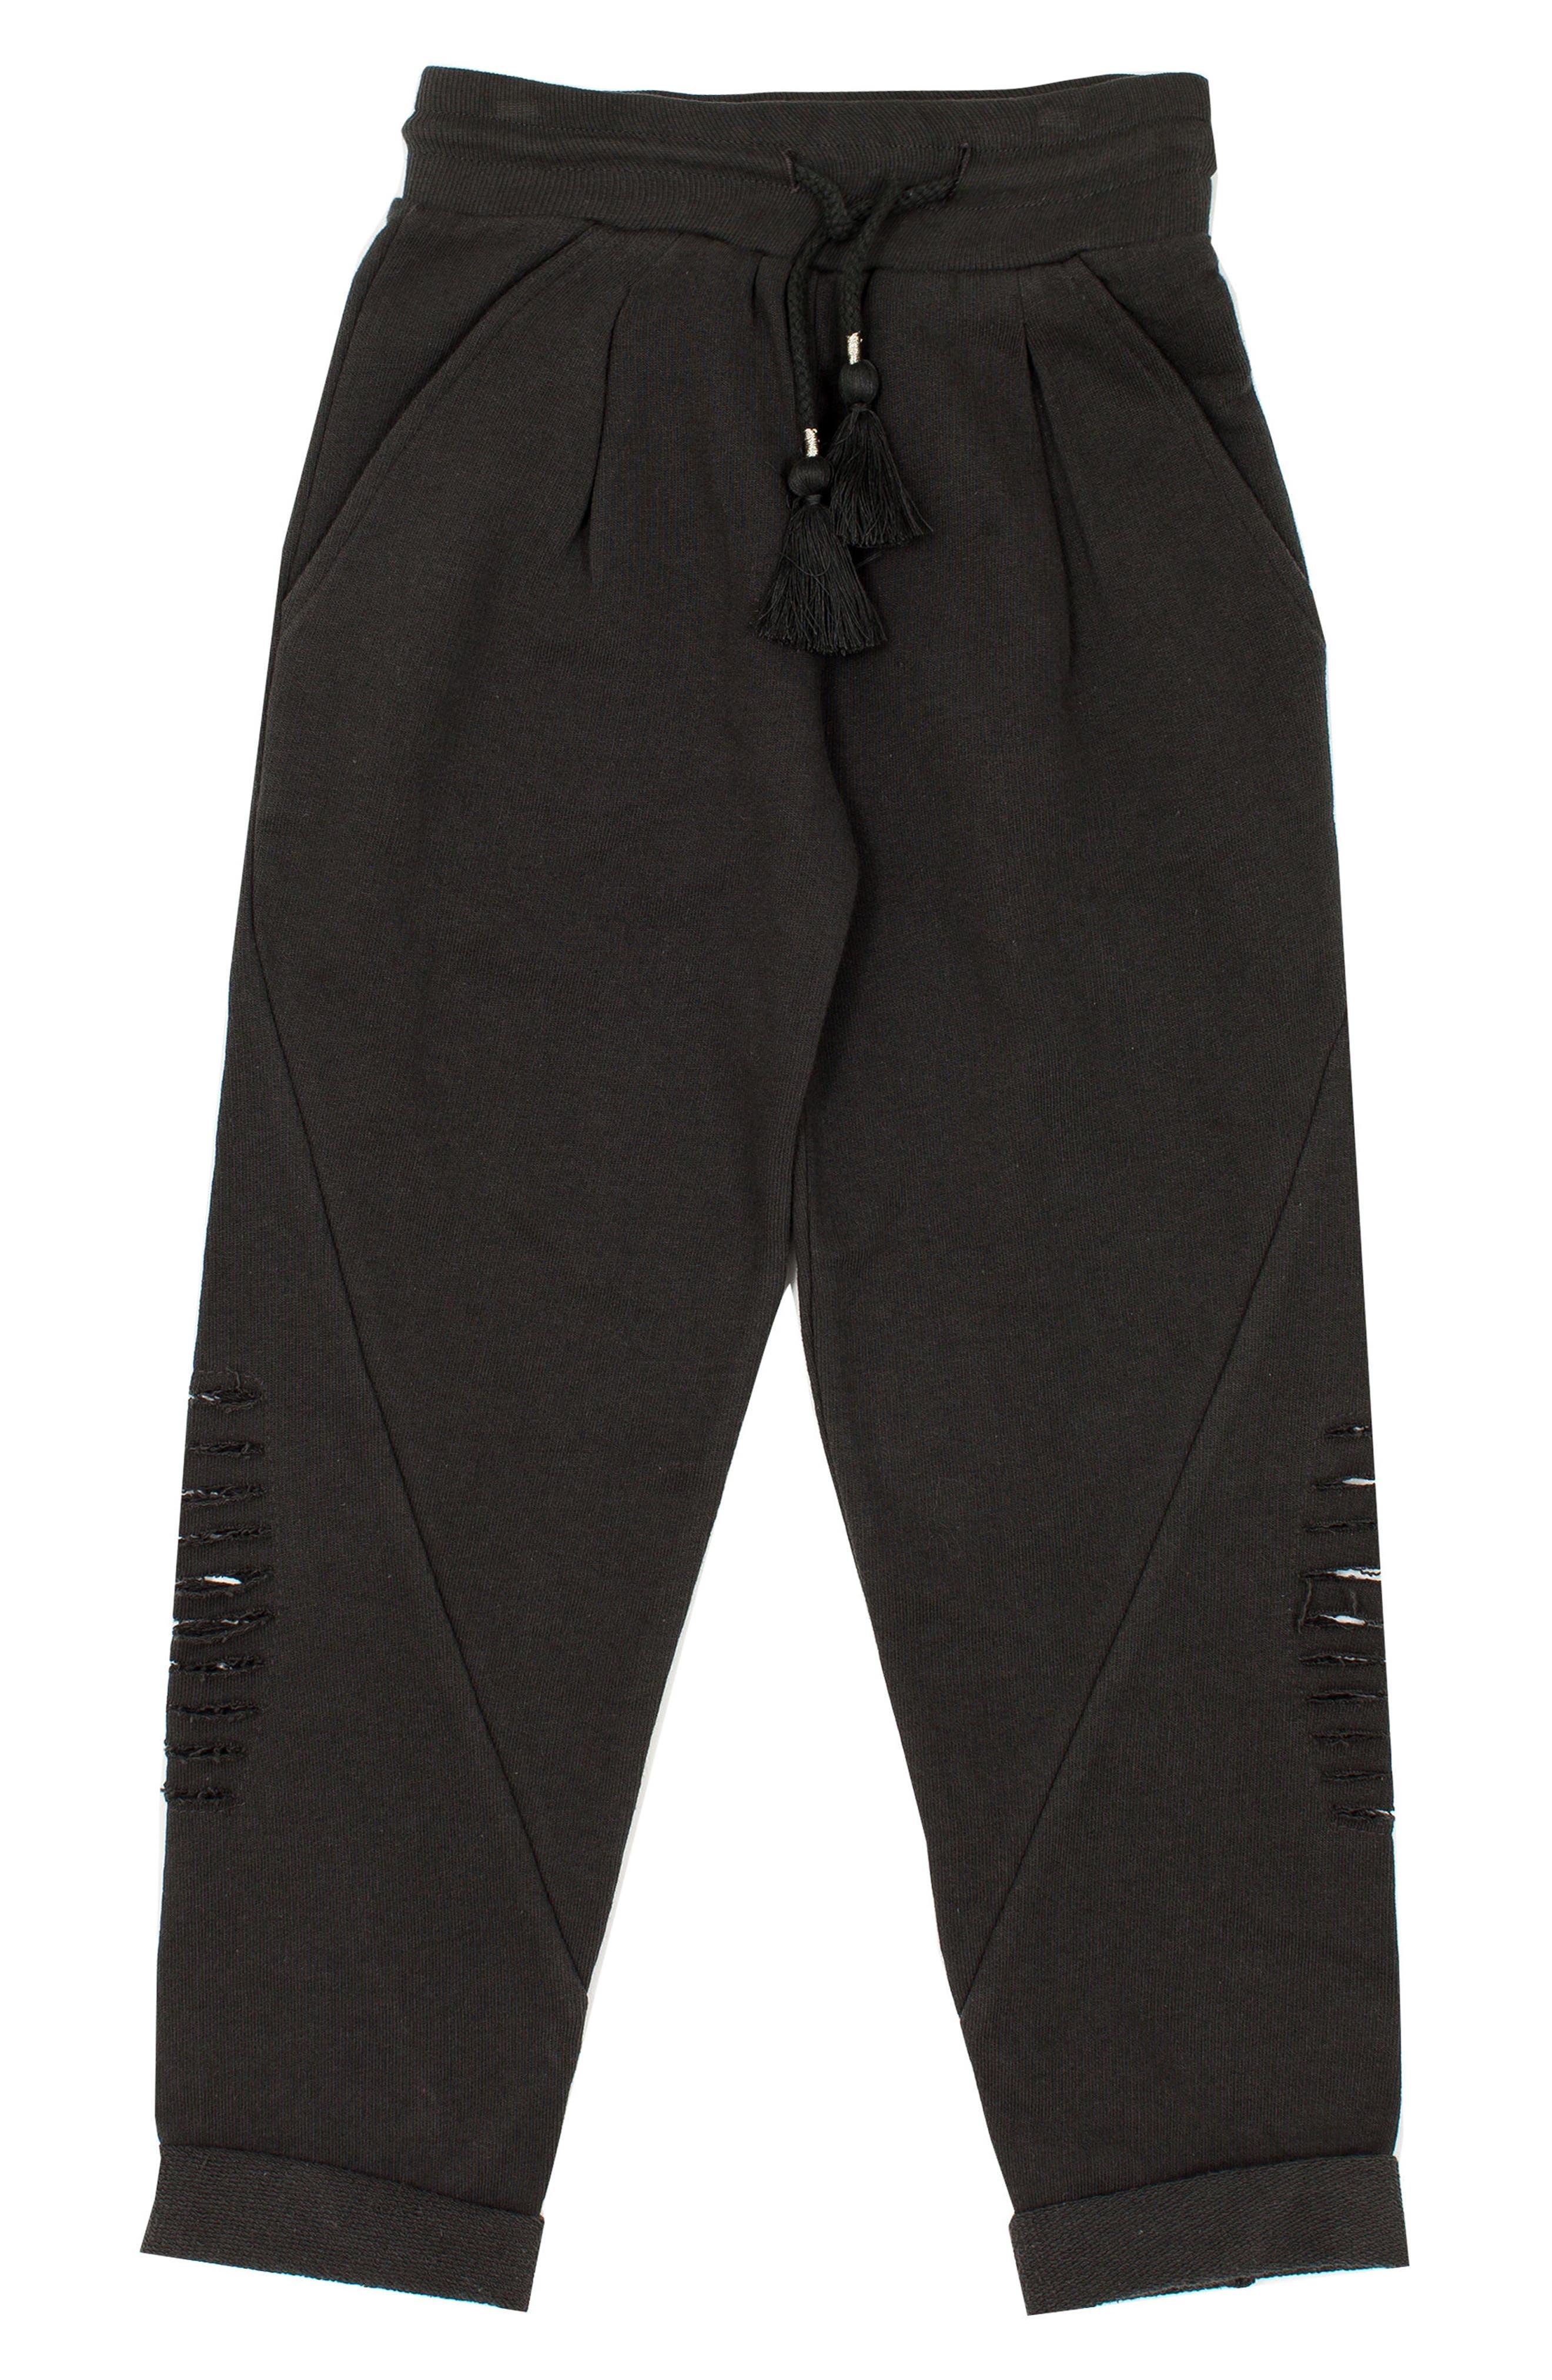 Alchemy Distressed Sweatpants,                         Main,                         color, TITANIUM